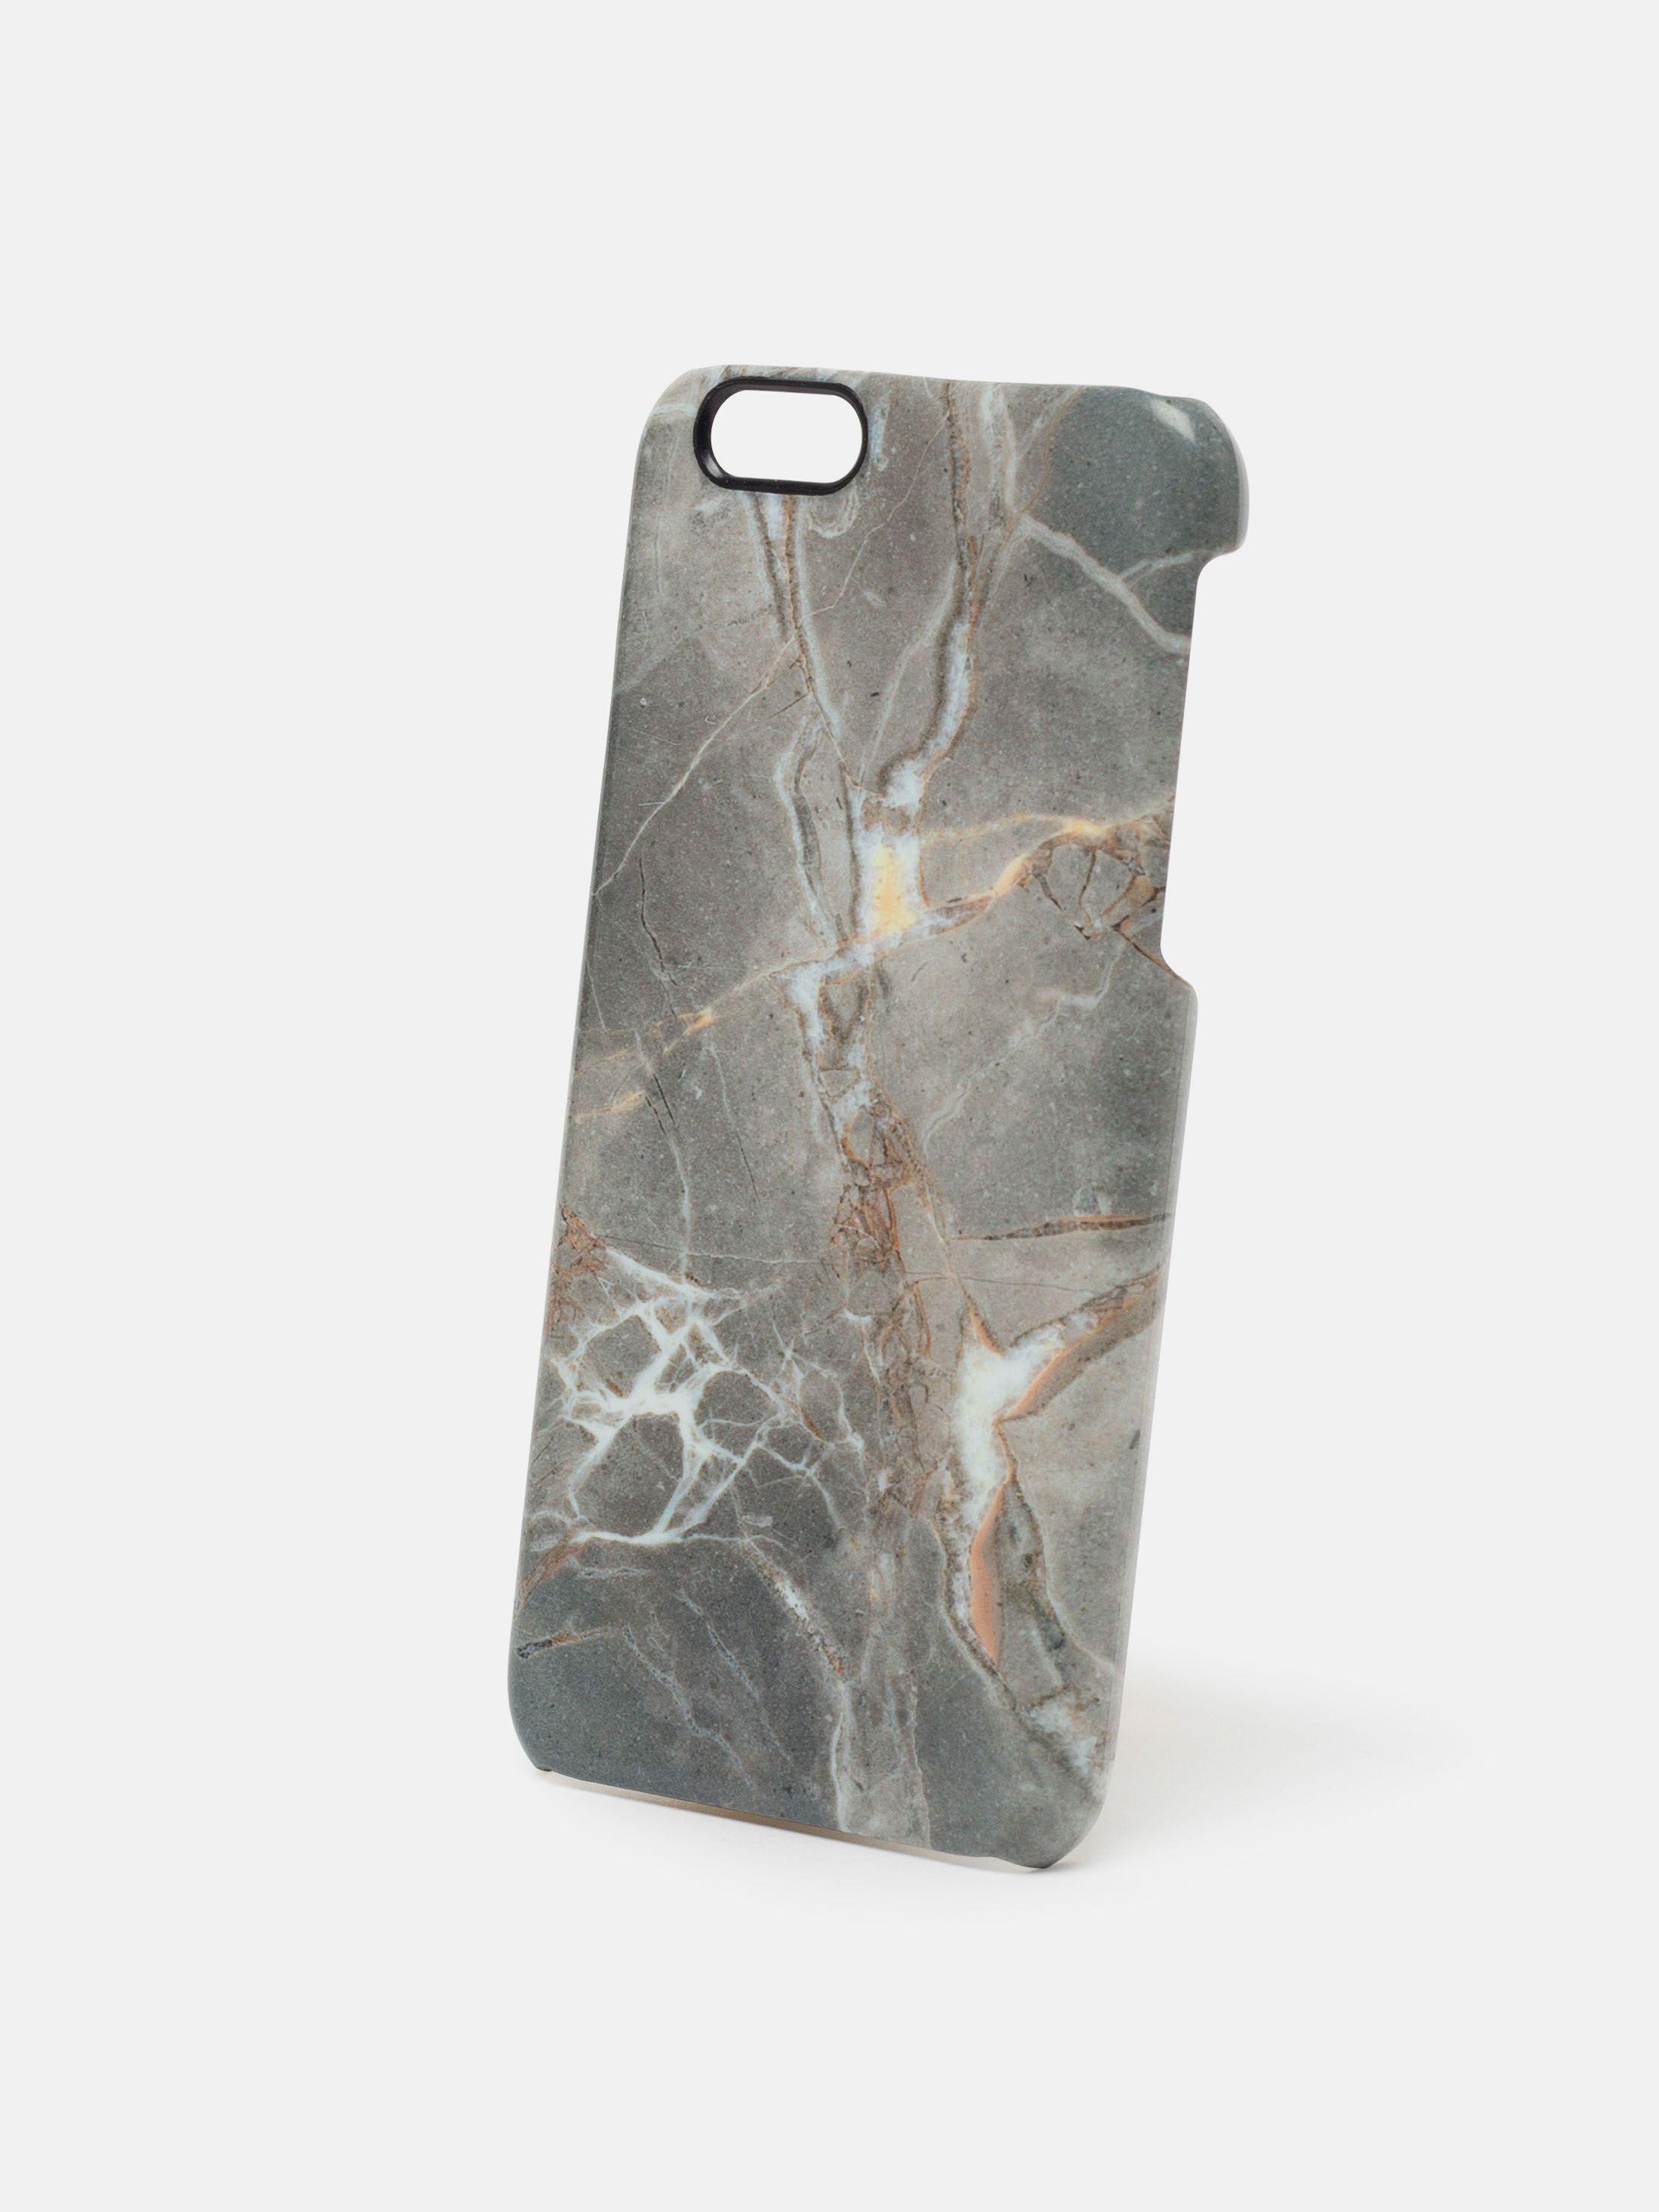 iPhone 6カバーにデザイン印刷